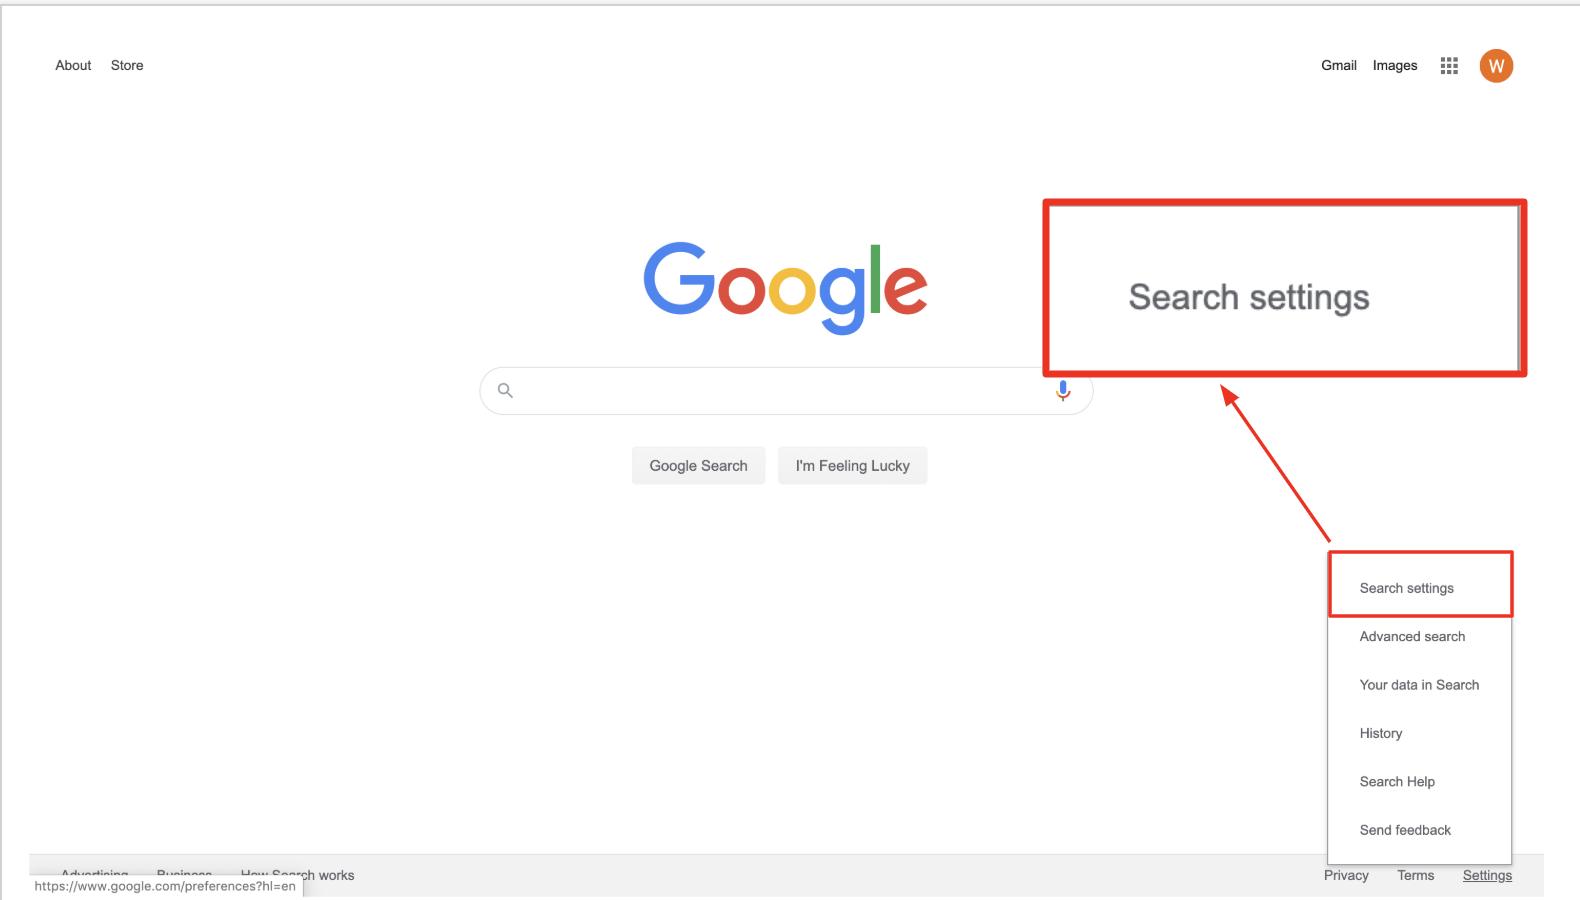 google search settings menu